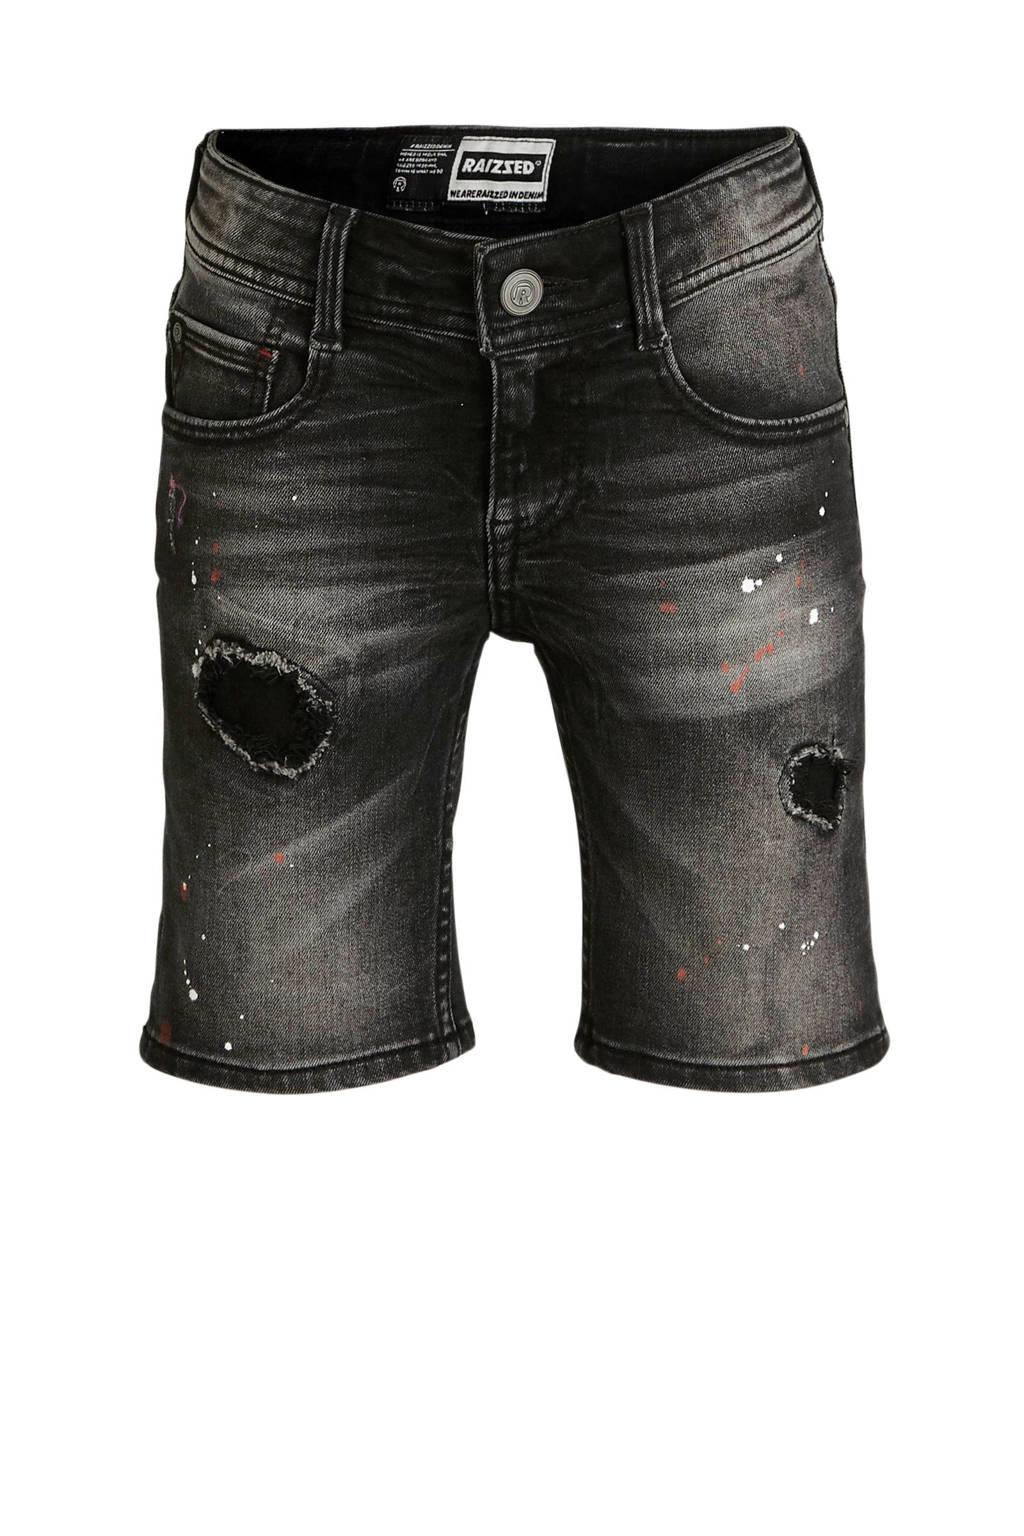 Raizzed jeans bermuda Oregon Crafted vintage black, Vintage black